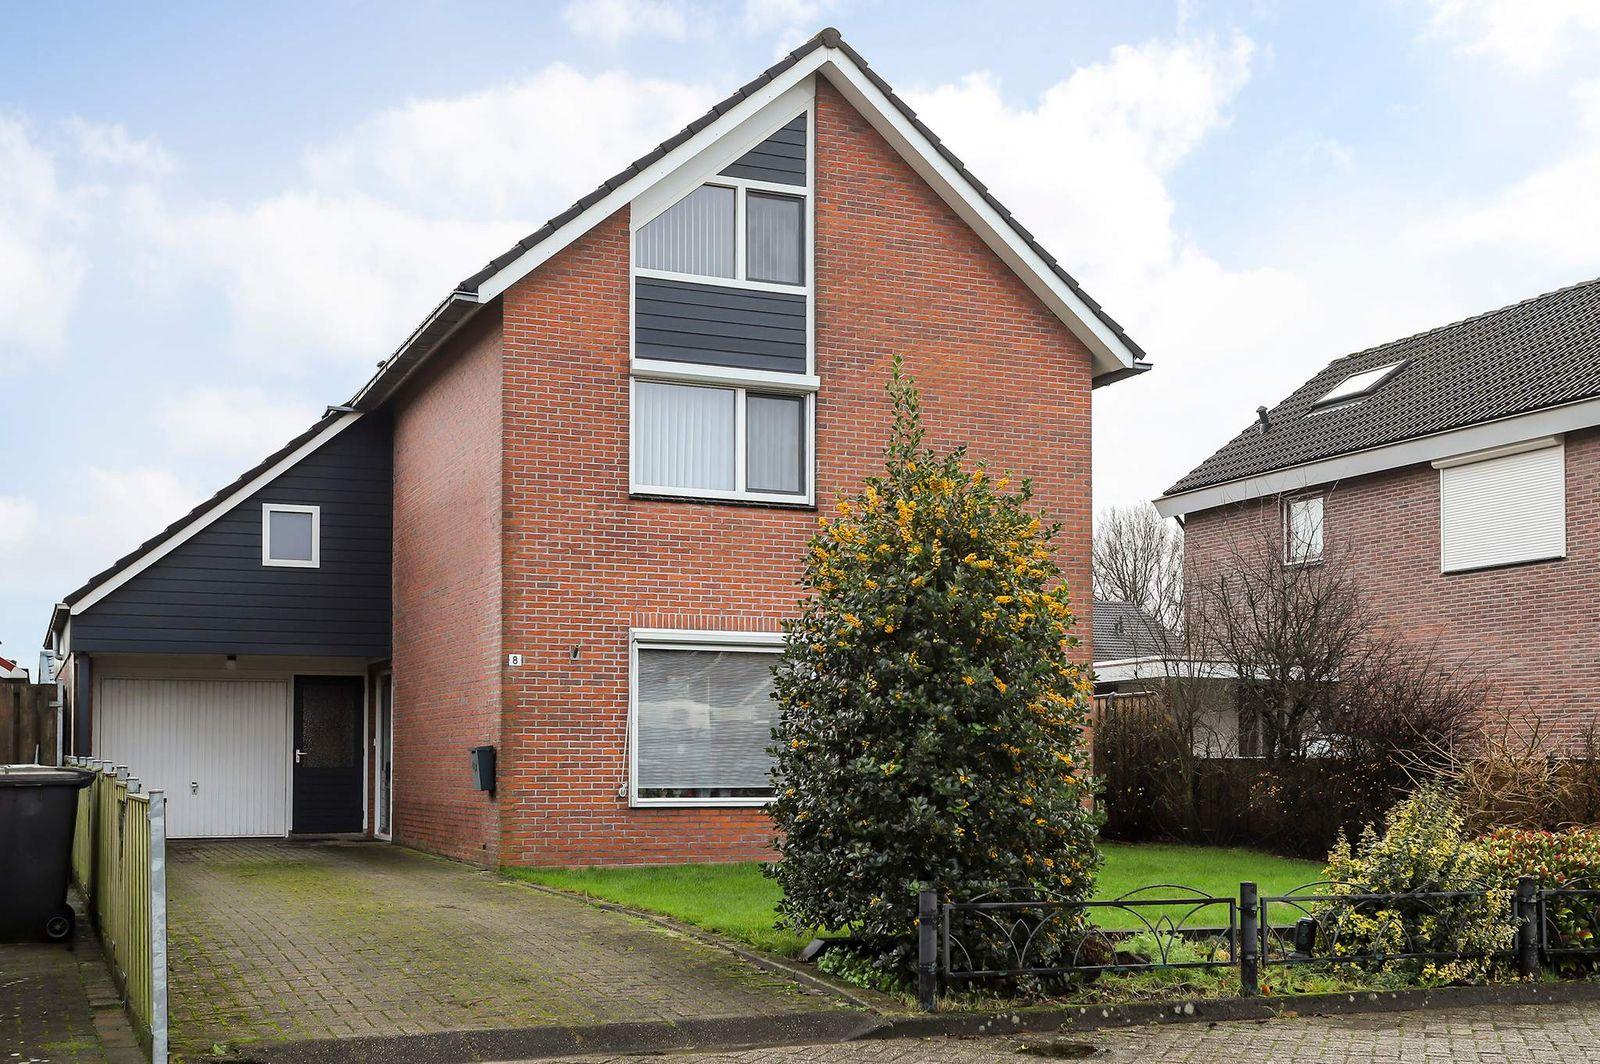 Wildvang 8, Nieuw-amsterdam